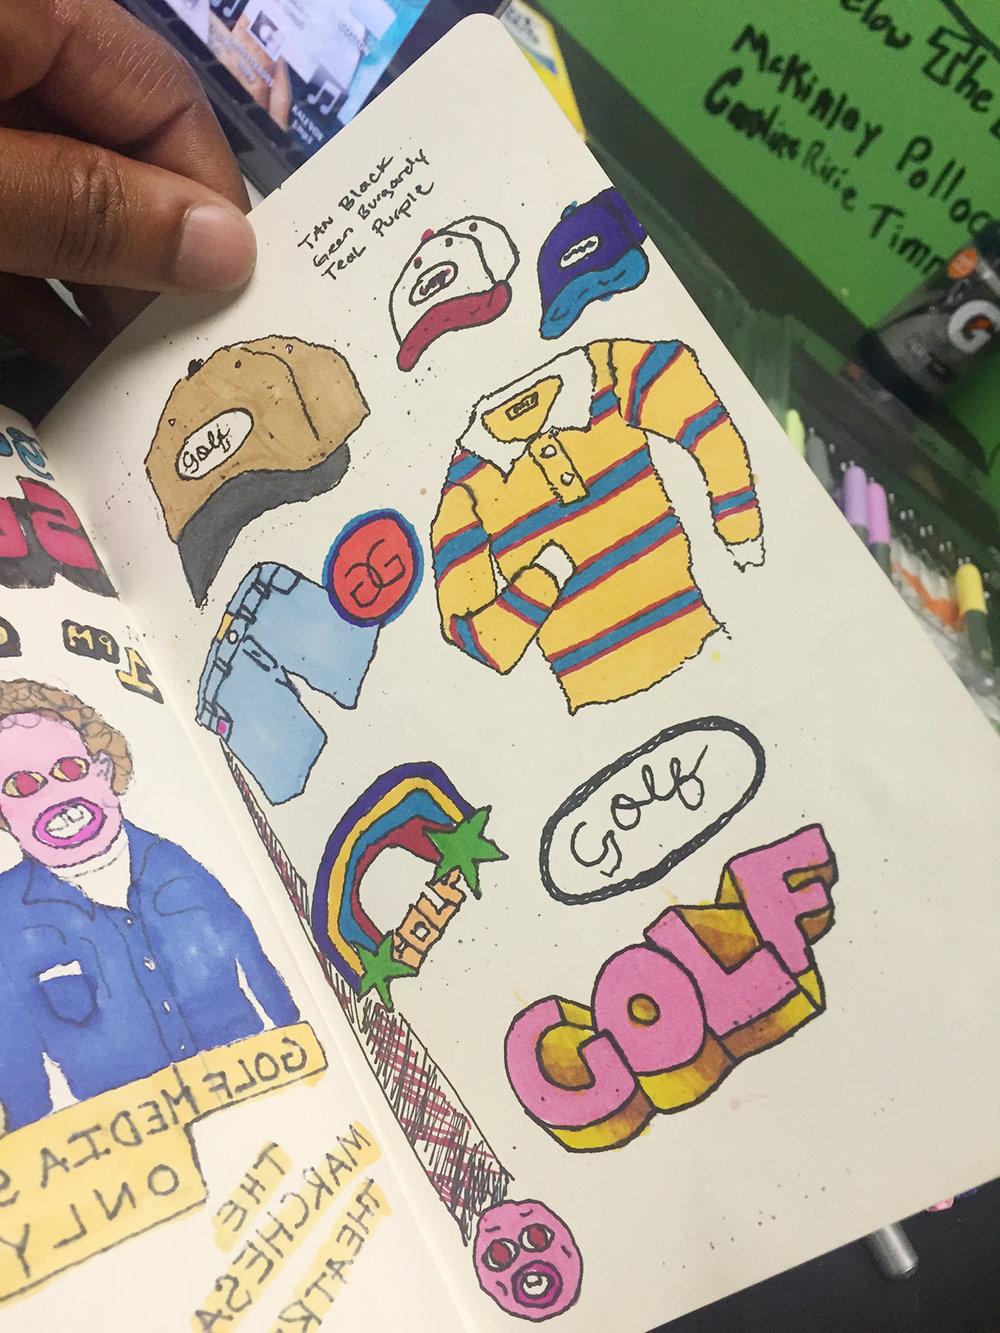 phil-toselli-golf-wang-interview-4.jpg